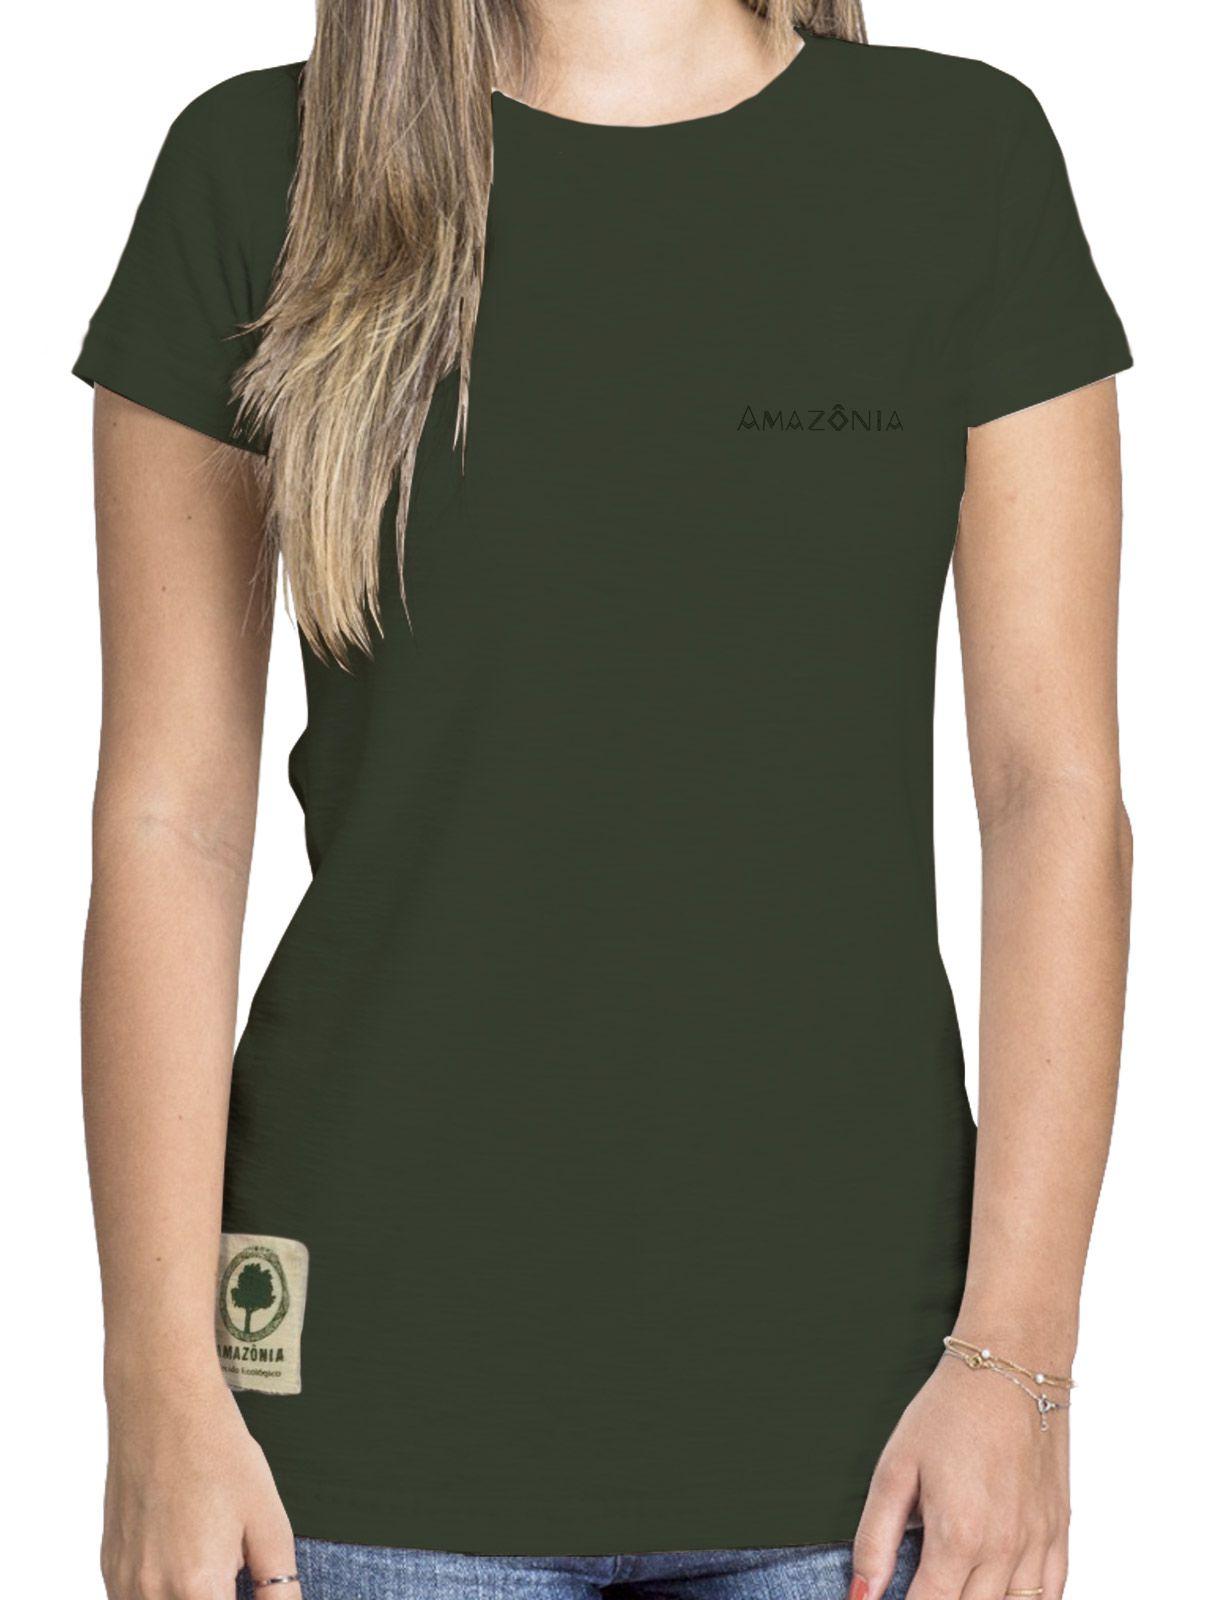 Baby Look Amazônia Colagem Logo - Verde Escuro